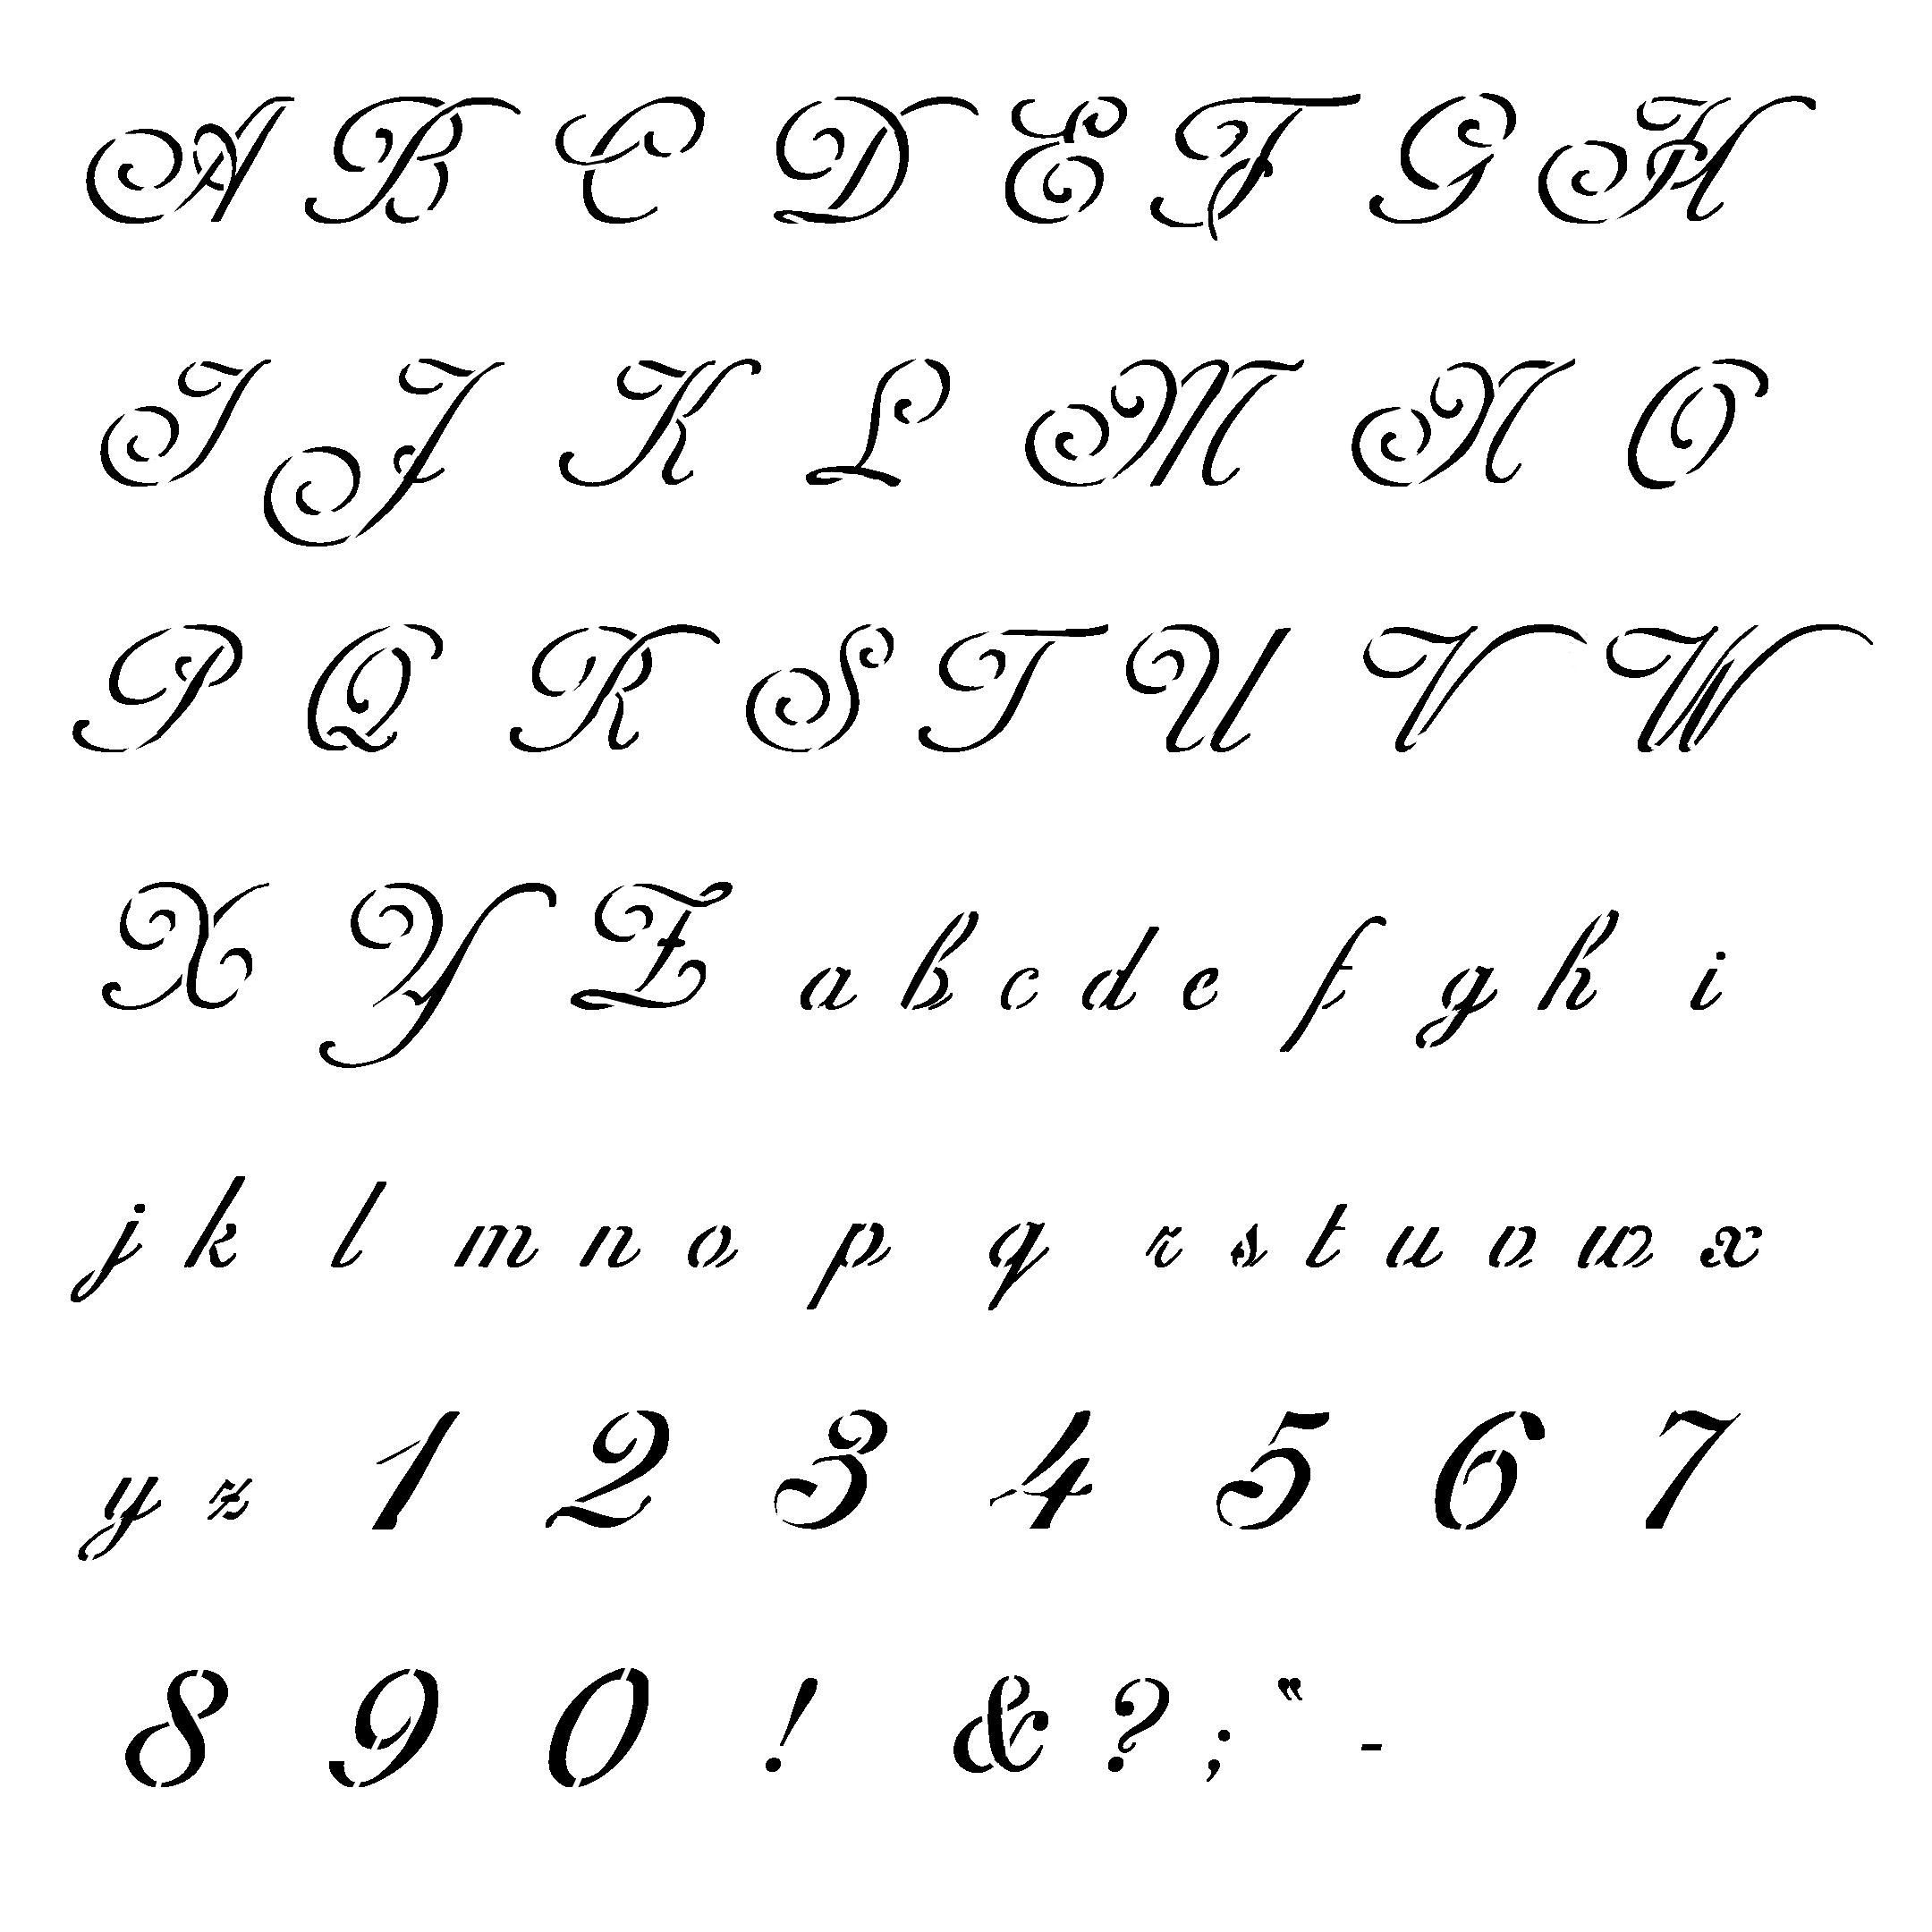 Free Printable Alphabet Stencils Templates – Smasu - Free Printable Alphabet Stencils